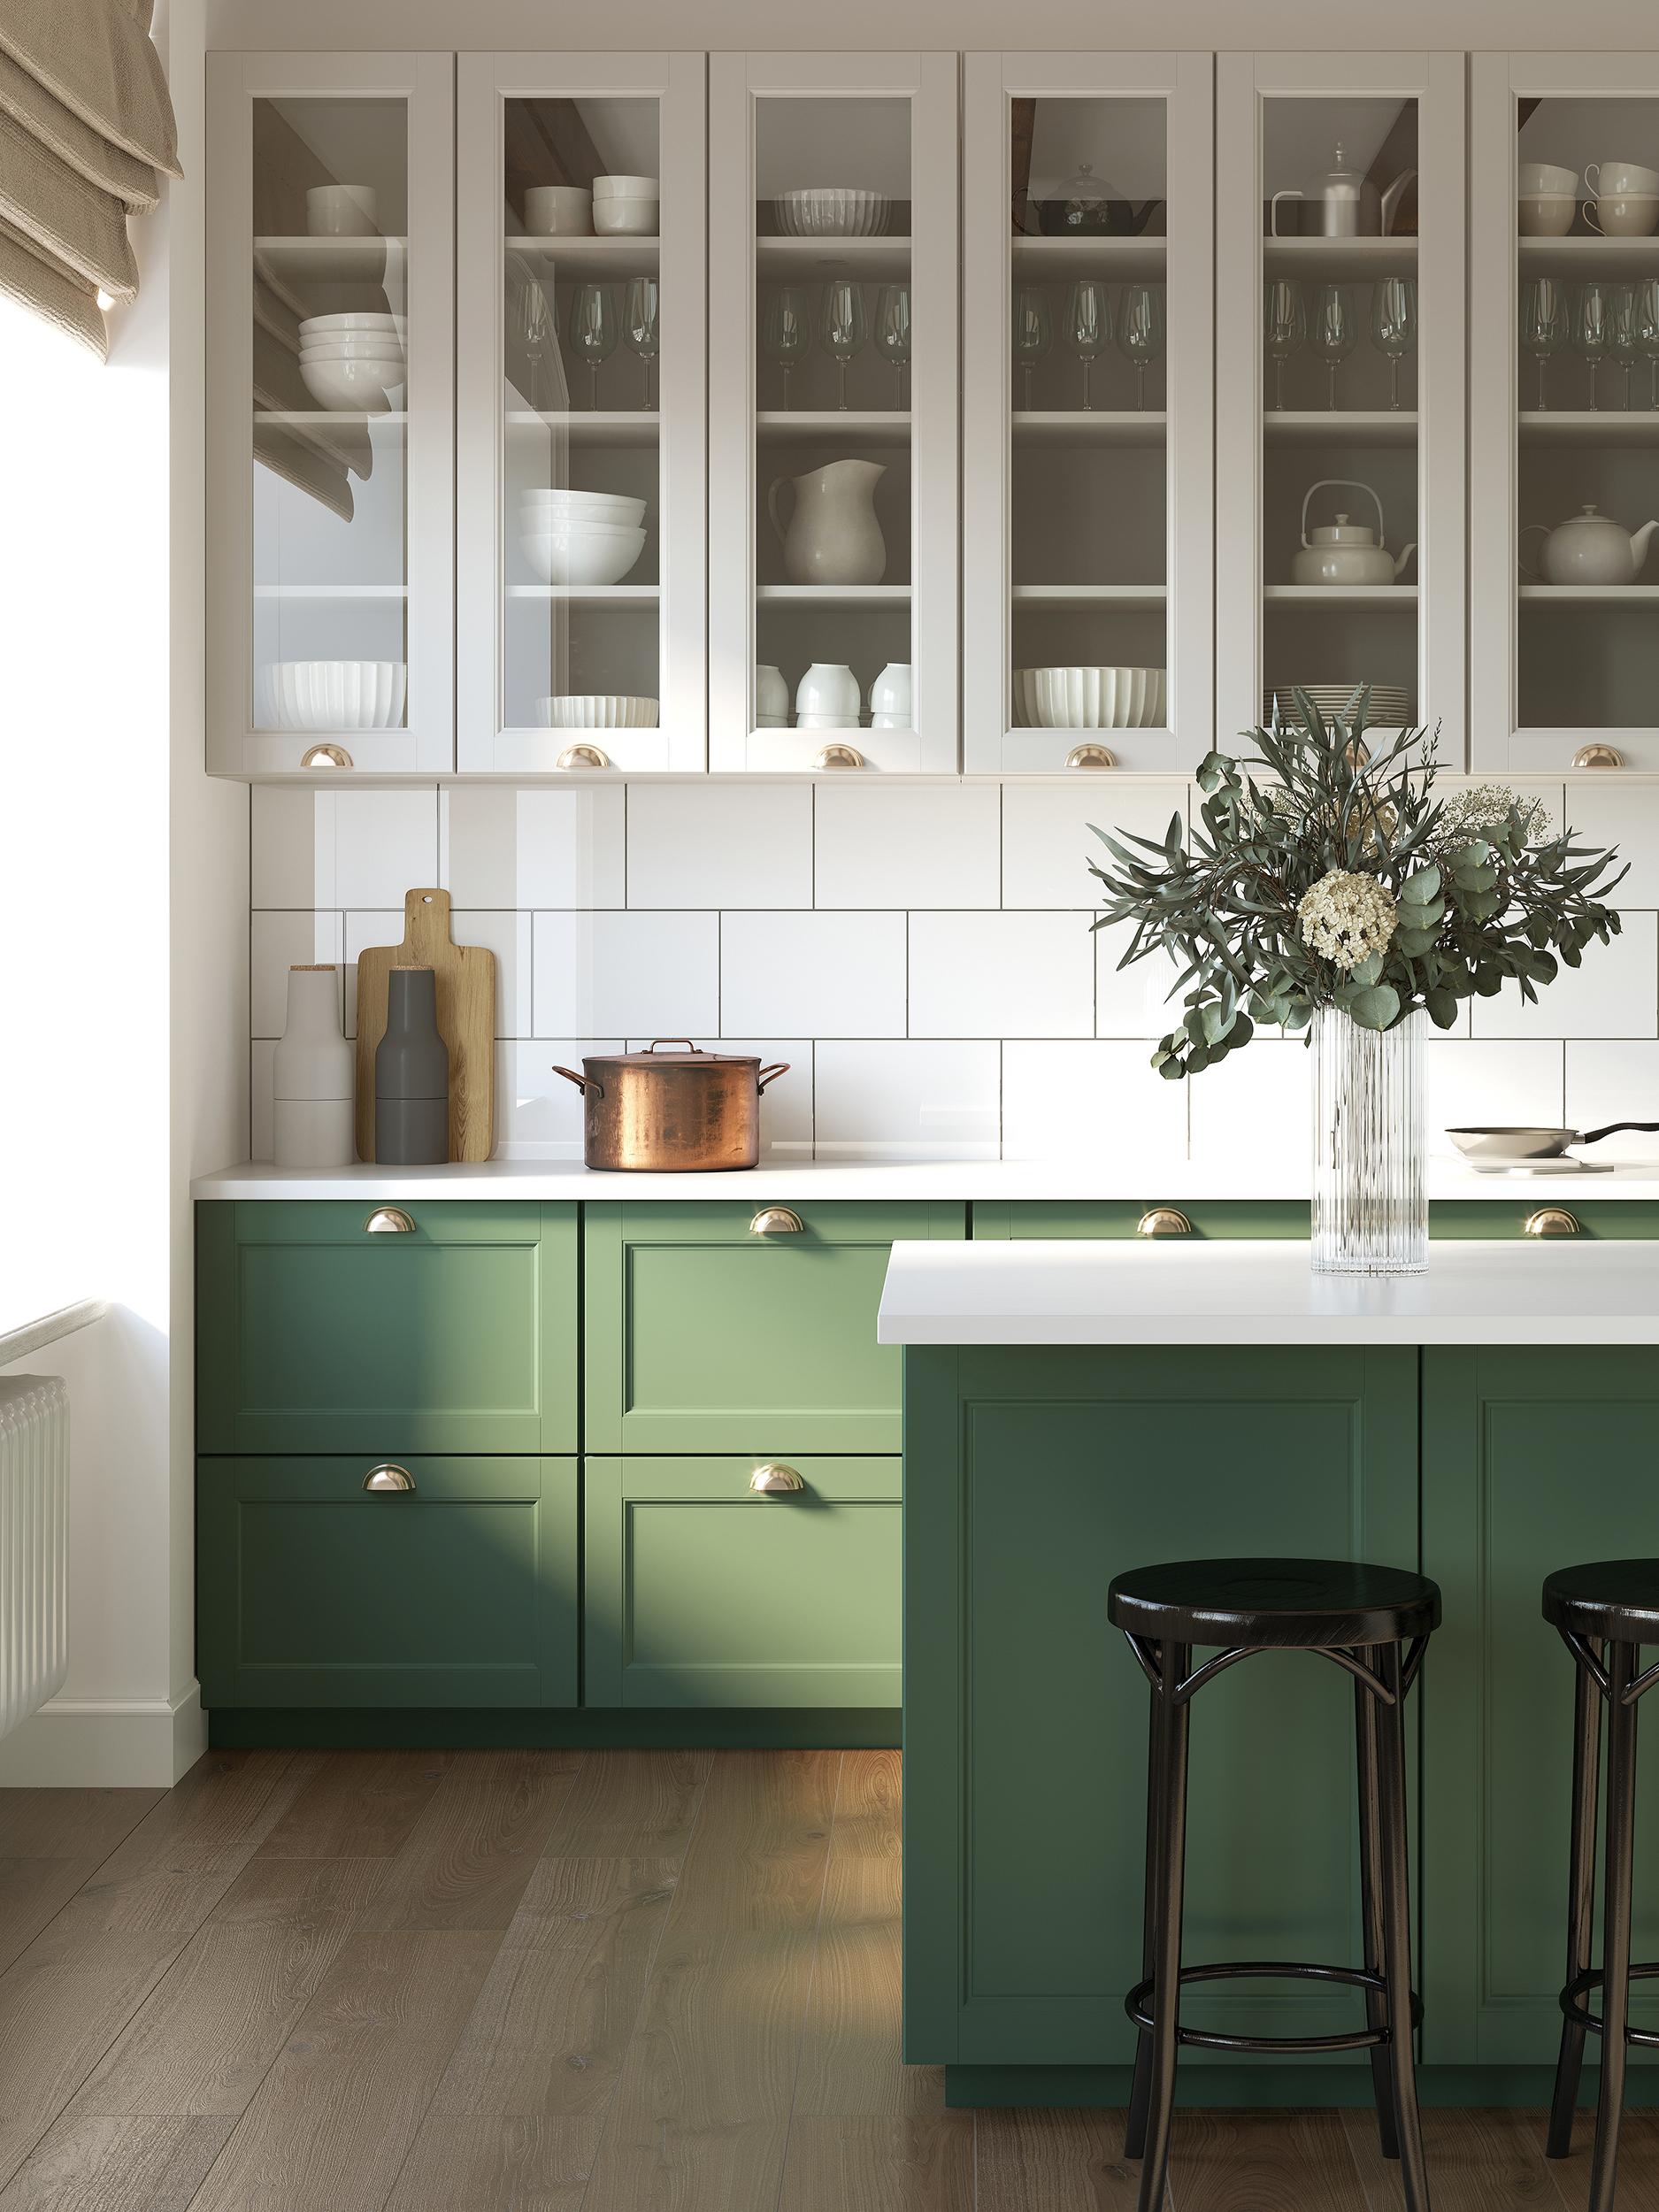 Inspiring Kitchen Design Styles for 2021 2